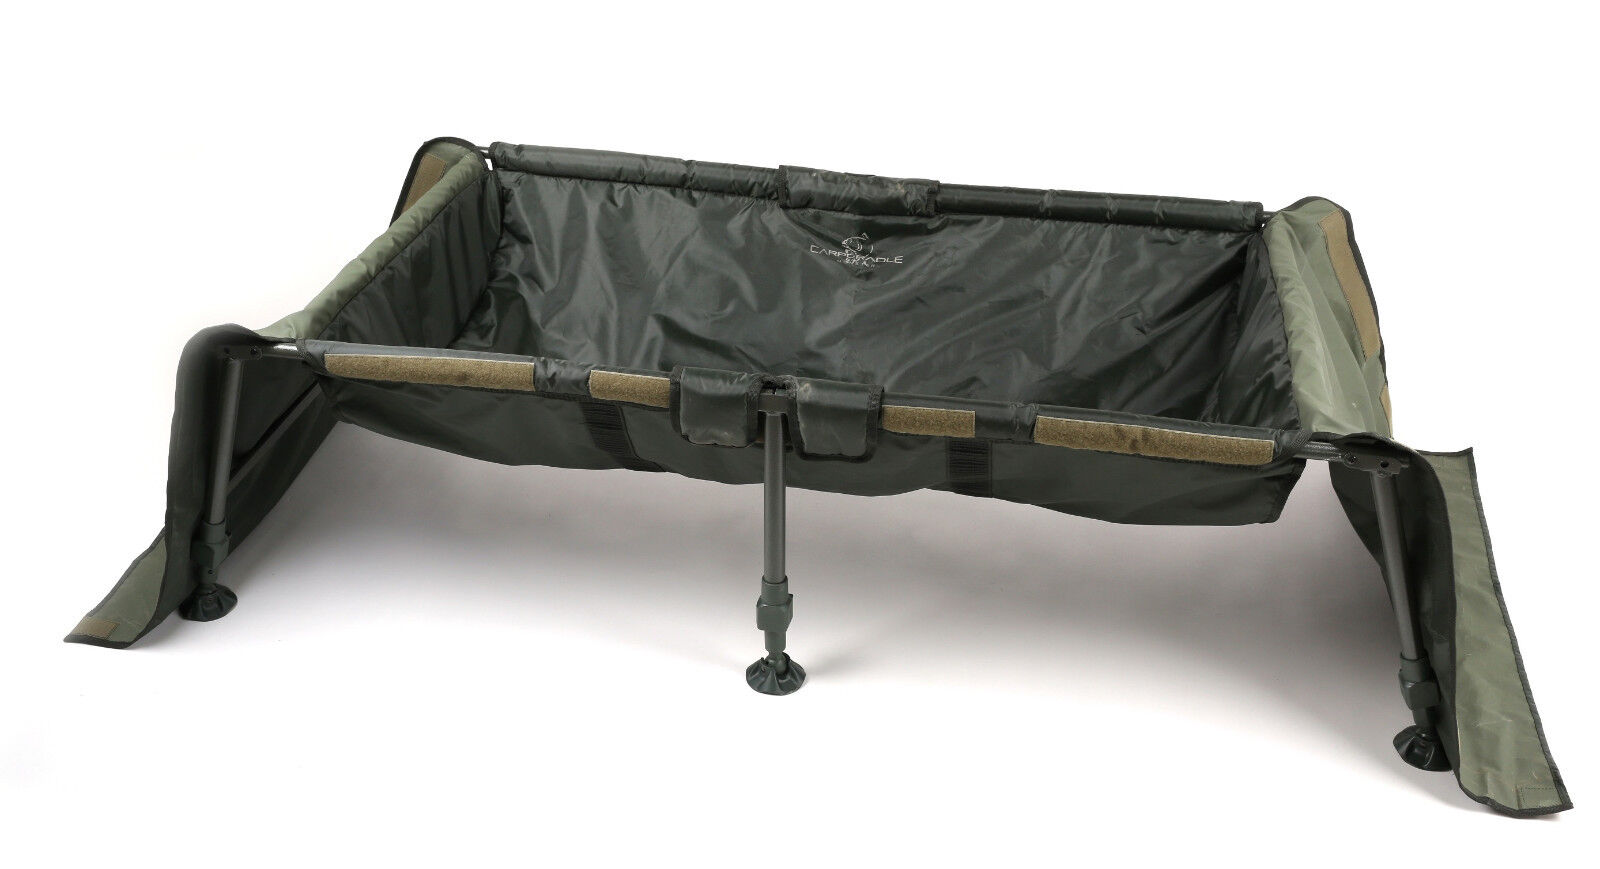 Nash monstruo carp Cradle mk3 t0144 abhakmatte maletero unhooking mat